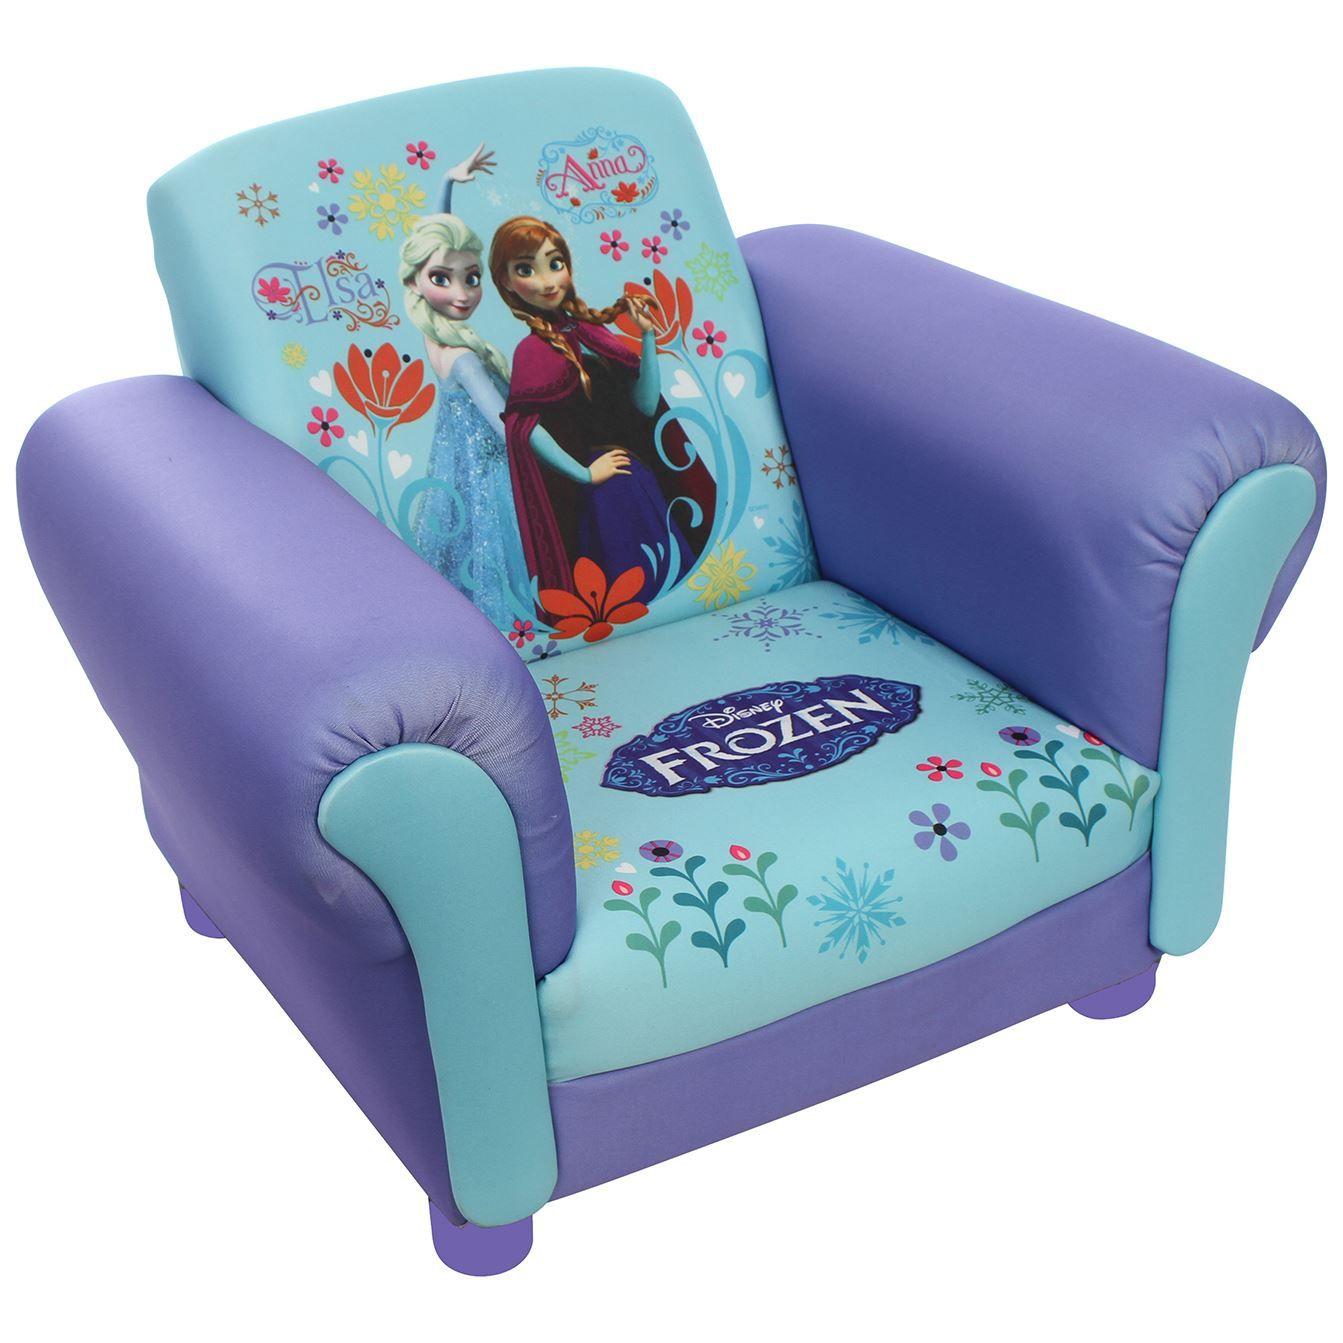 Childrens Disney Kids Frozen Anna U0026 Elsa Mickey Mouse Cartoon UPHOLSTERED  Chair | EBay